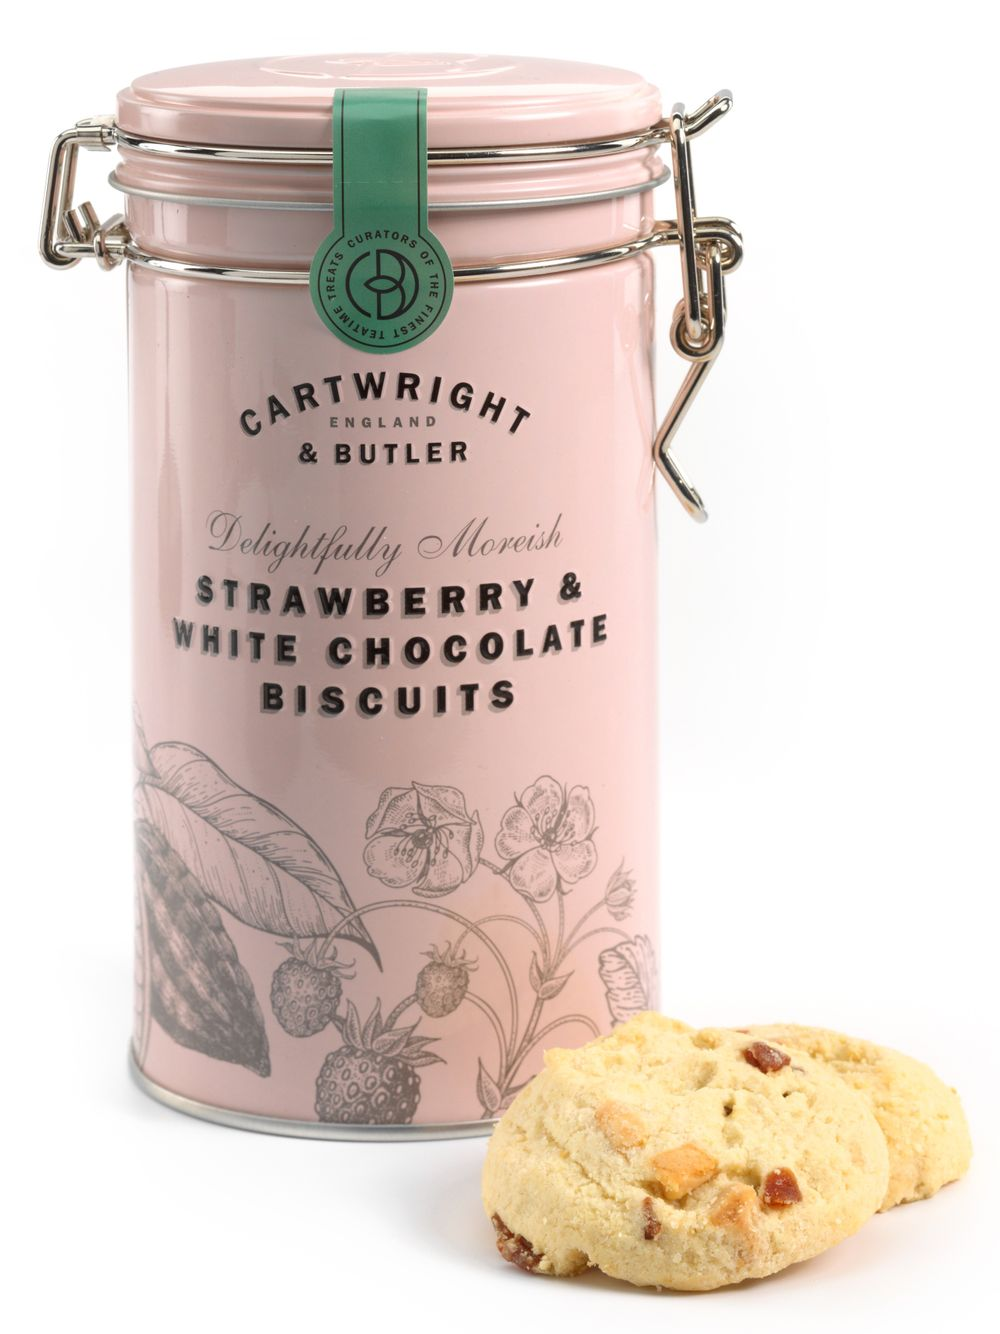 Strawberry & White Chocolate Biscuit Tin